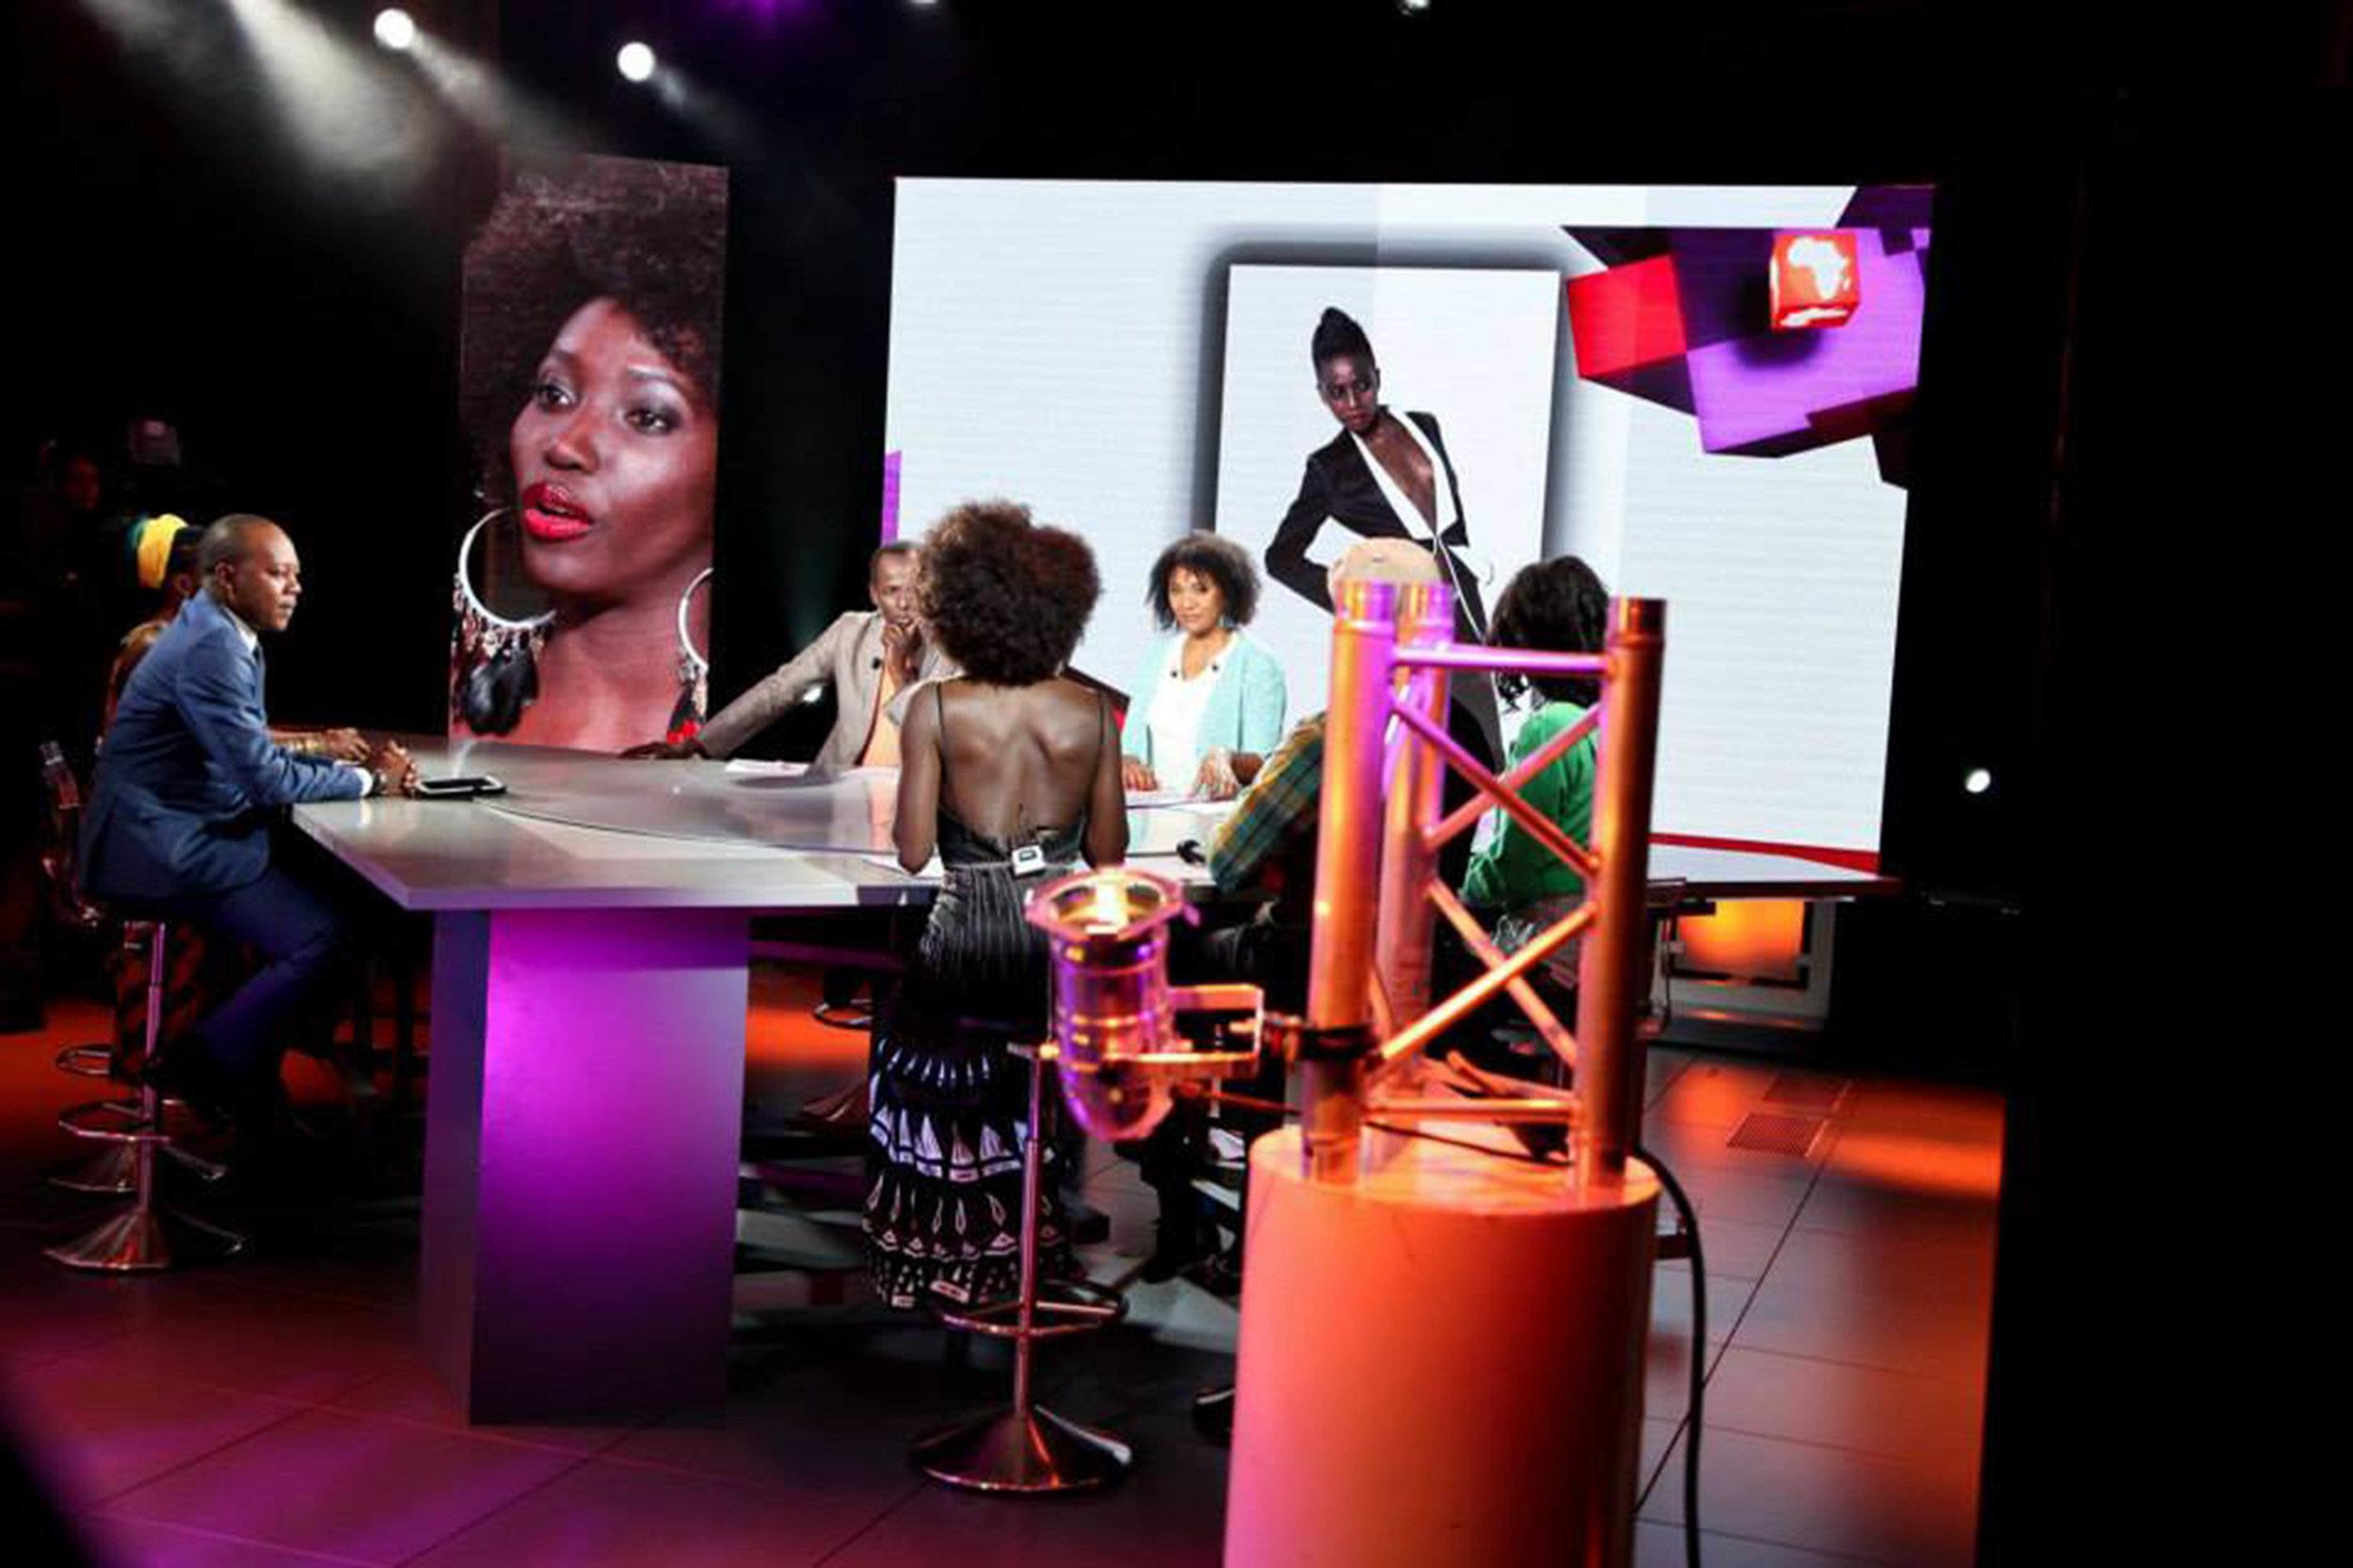 2-otinguema-tv-presentation-african-fashiondesigner-tvshow-canalplusdafrique-canalplus-avril-2014.jpg